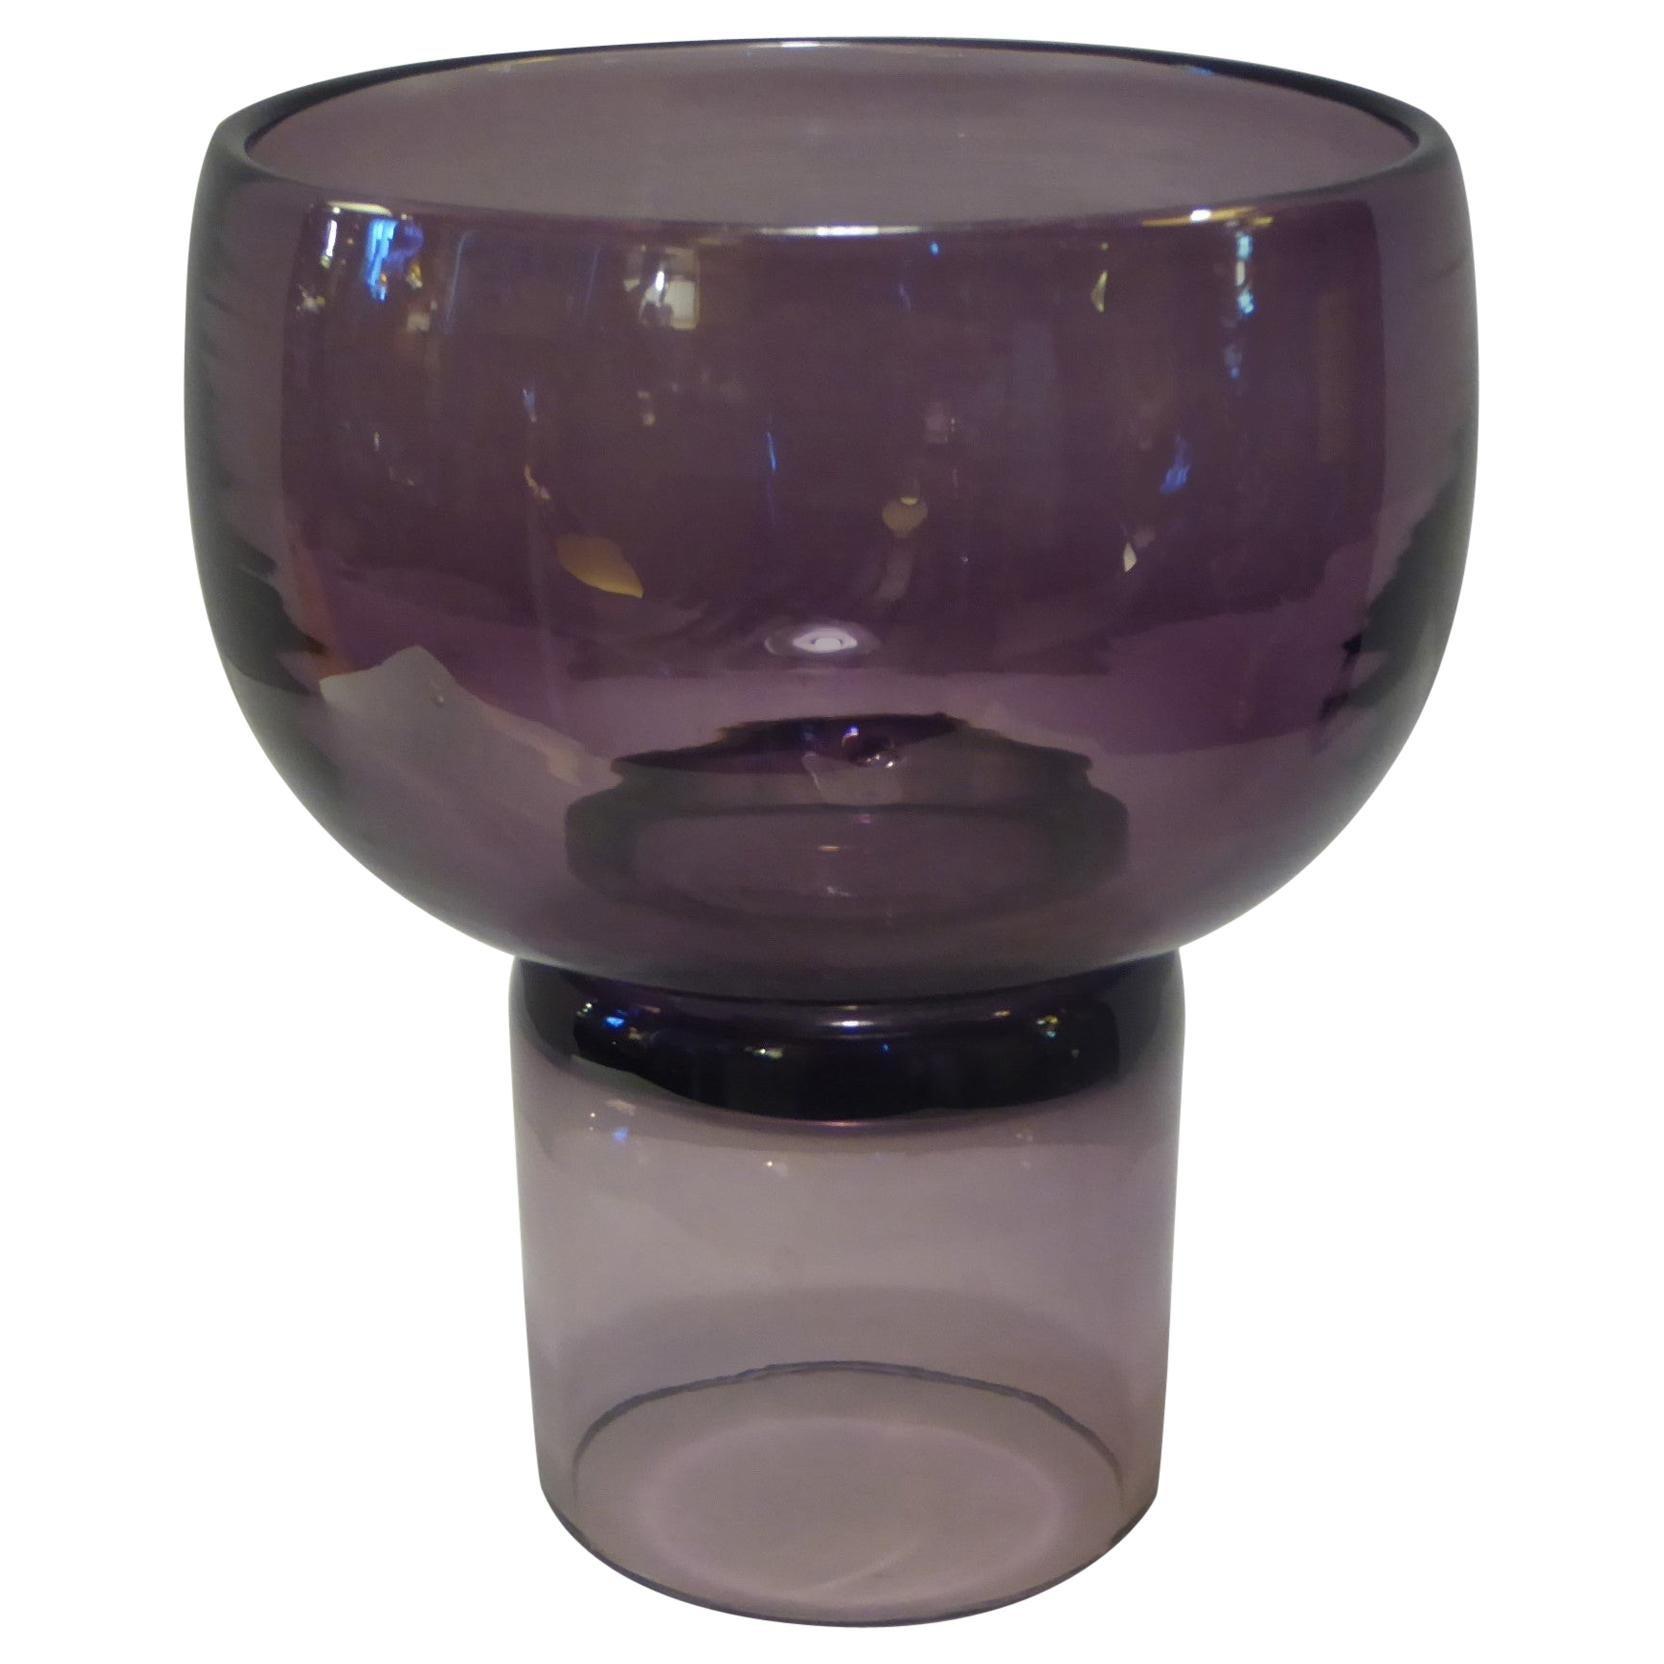 Rarely Seen 1950s Wayne Husted Blenko Chalice Vase